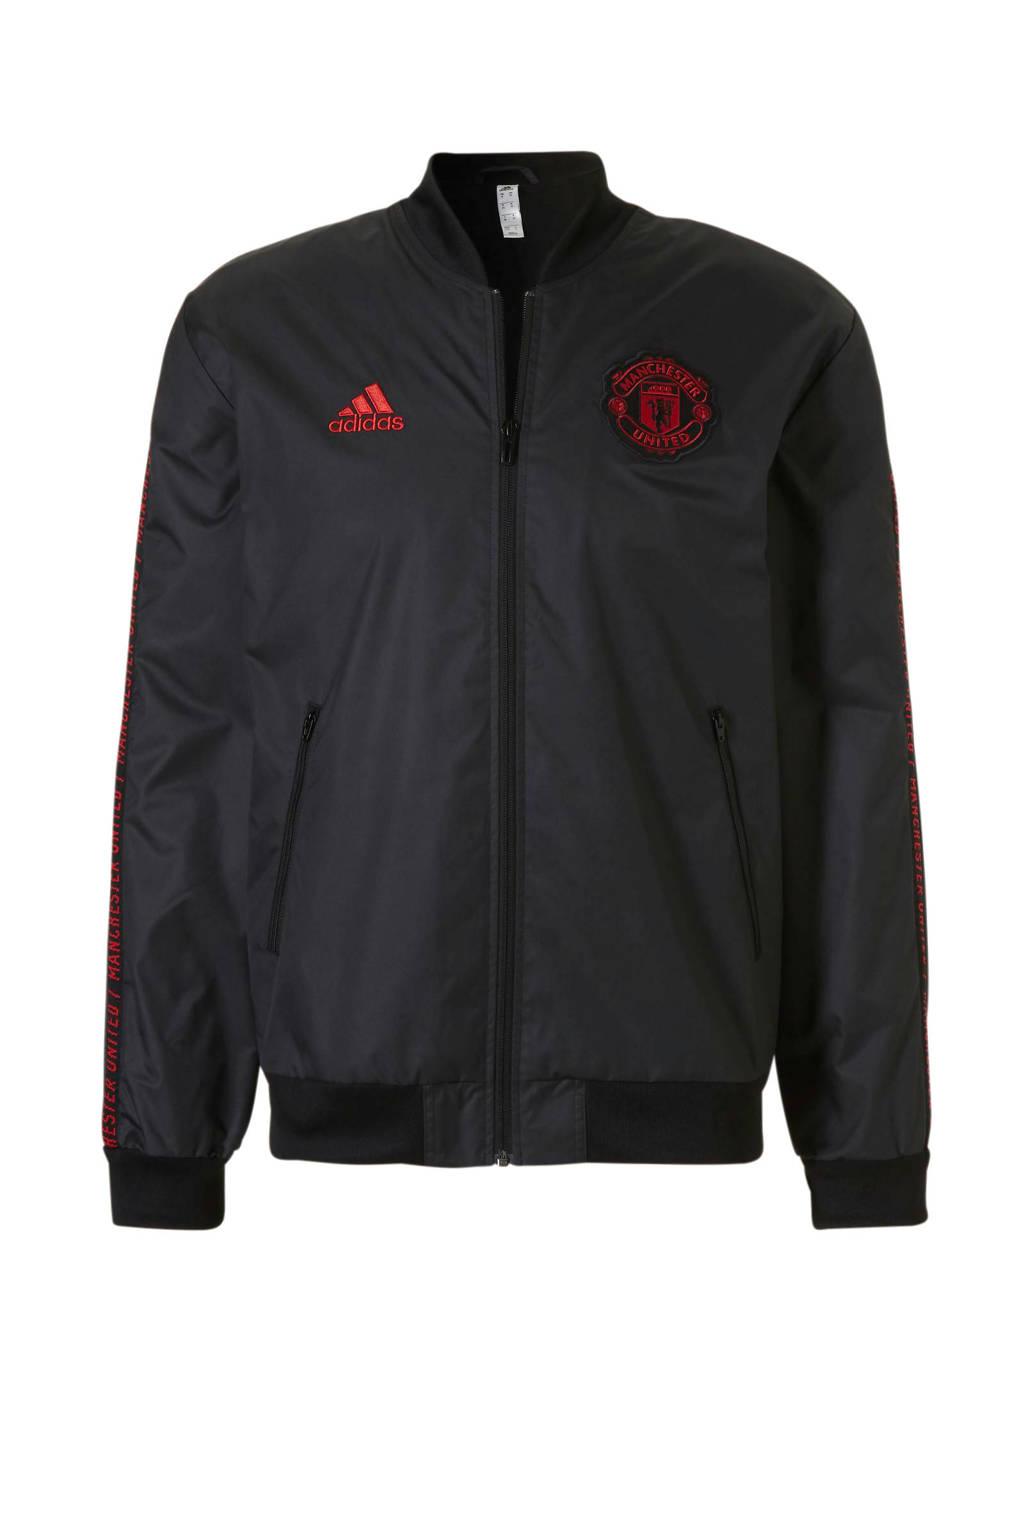 adidas performance Senior Manchester United voetbaljack, Zwart/rood